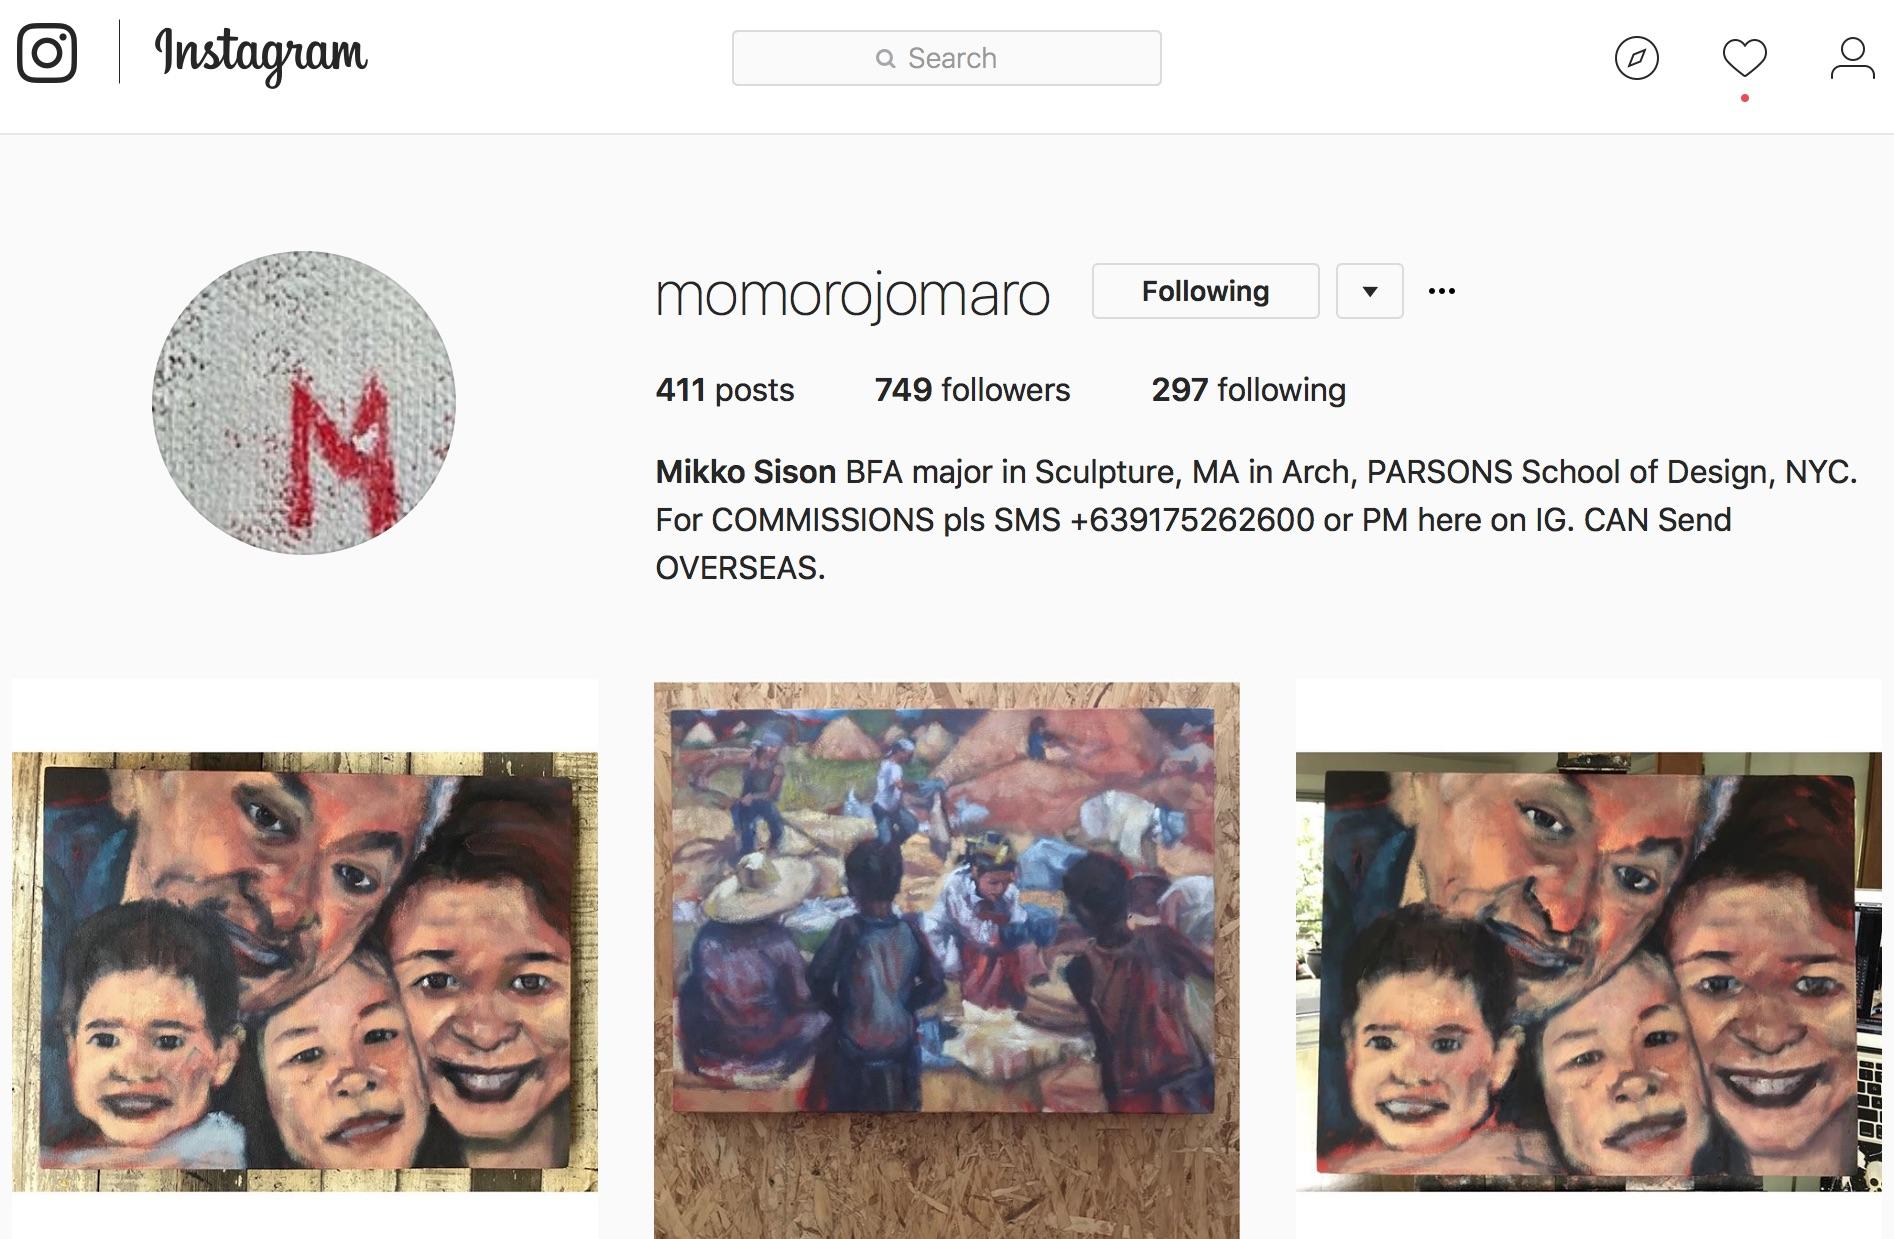 momorojomaro instagram mikko sison portraits